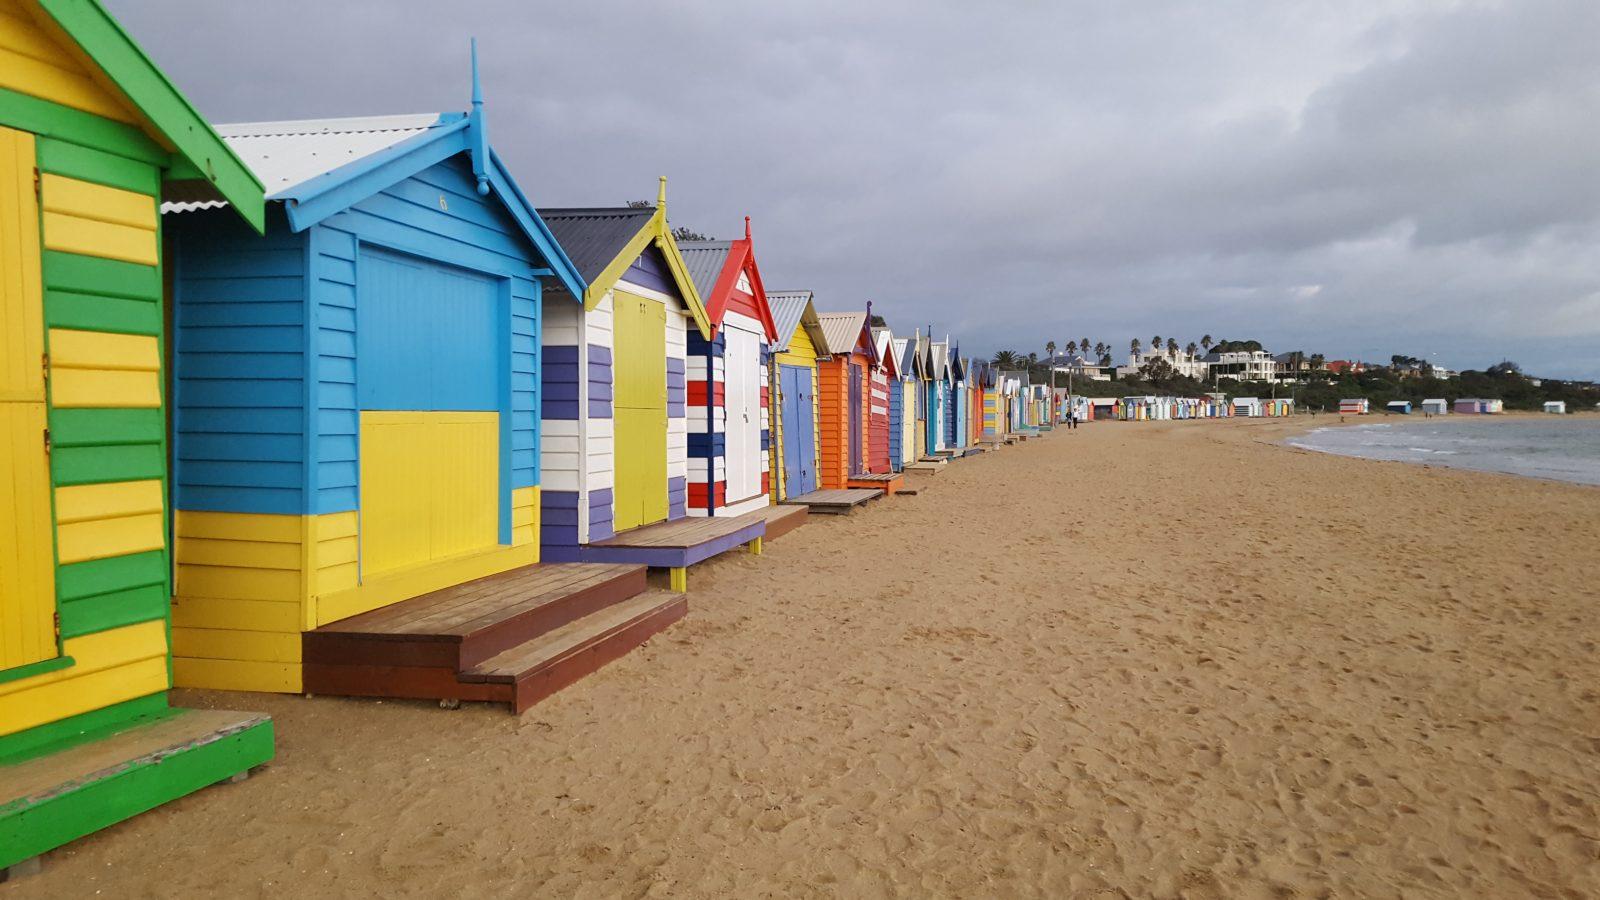 Brighton Beach plage cabanons